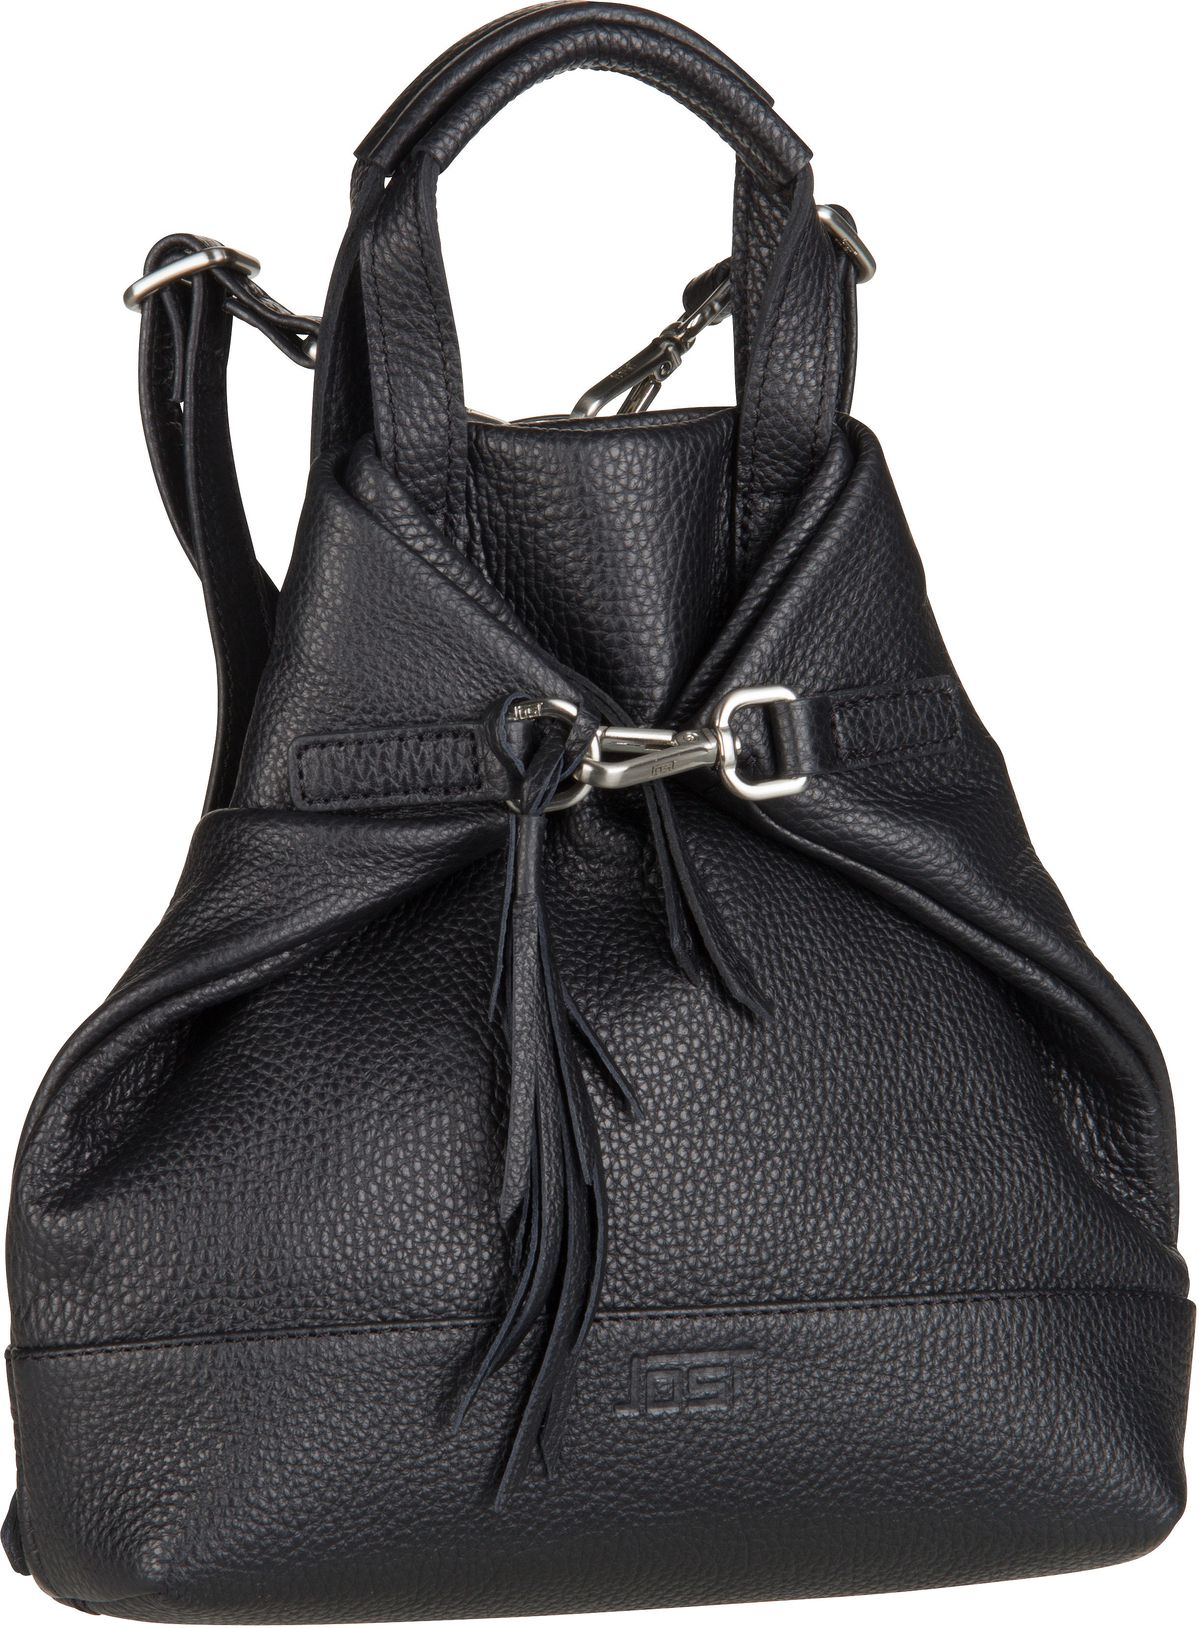 Rucksack / Daypack Vika 1840 X-Change Bag Mini Black